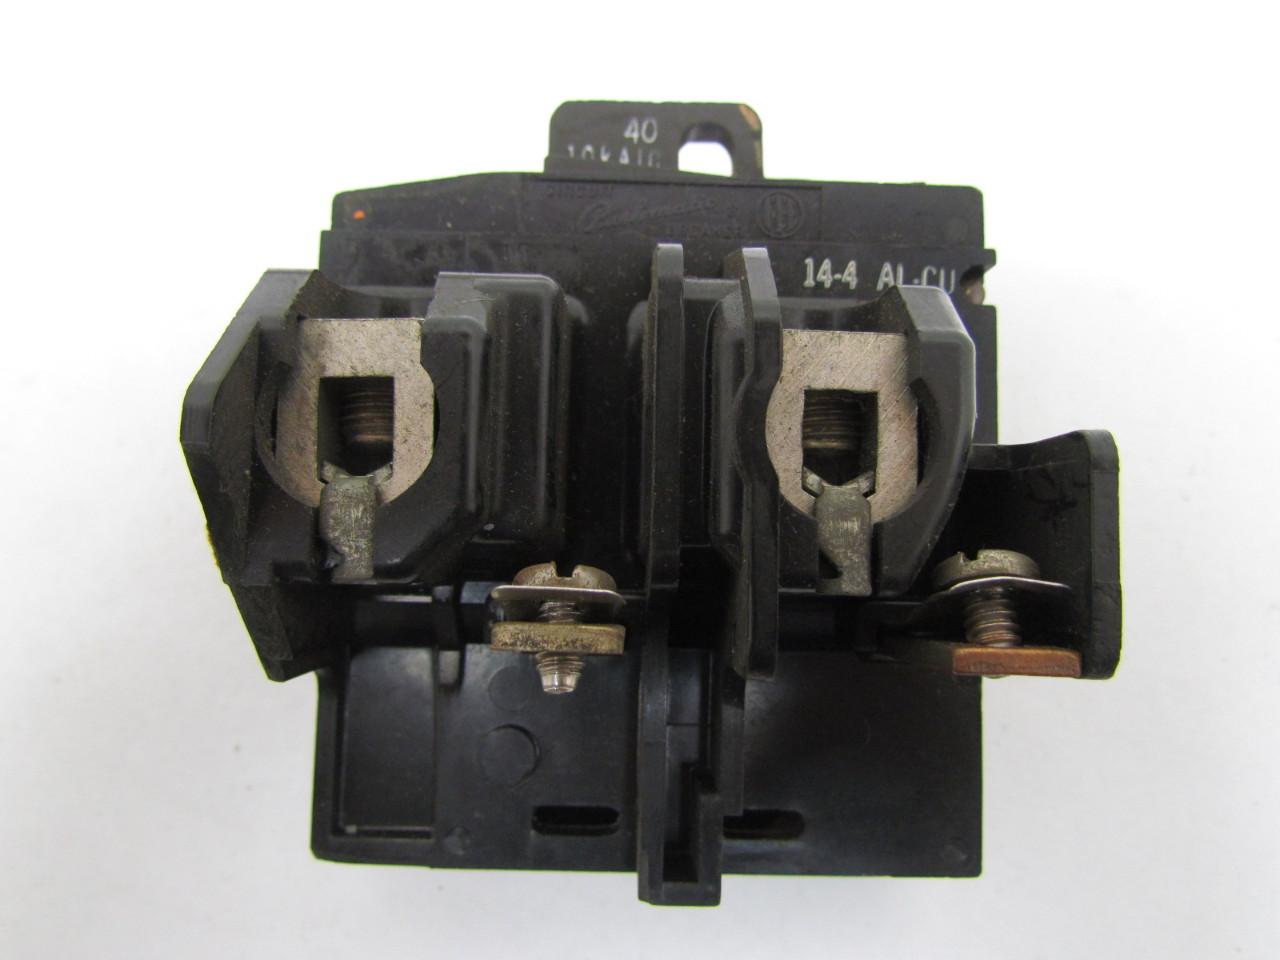 pushmatic breaker wiring diagram ge shunt trip breaker wiring diagram ite 10kaic 2-pole pushmatic circuit breaker 40 amp   ebay